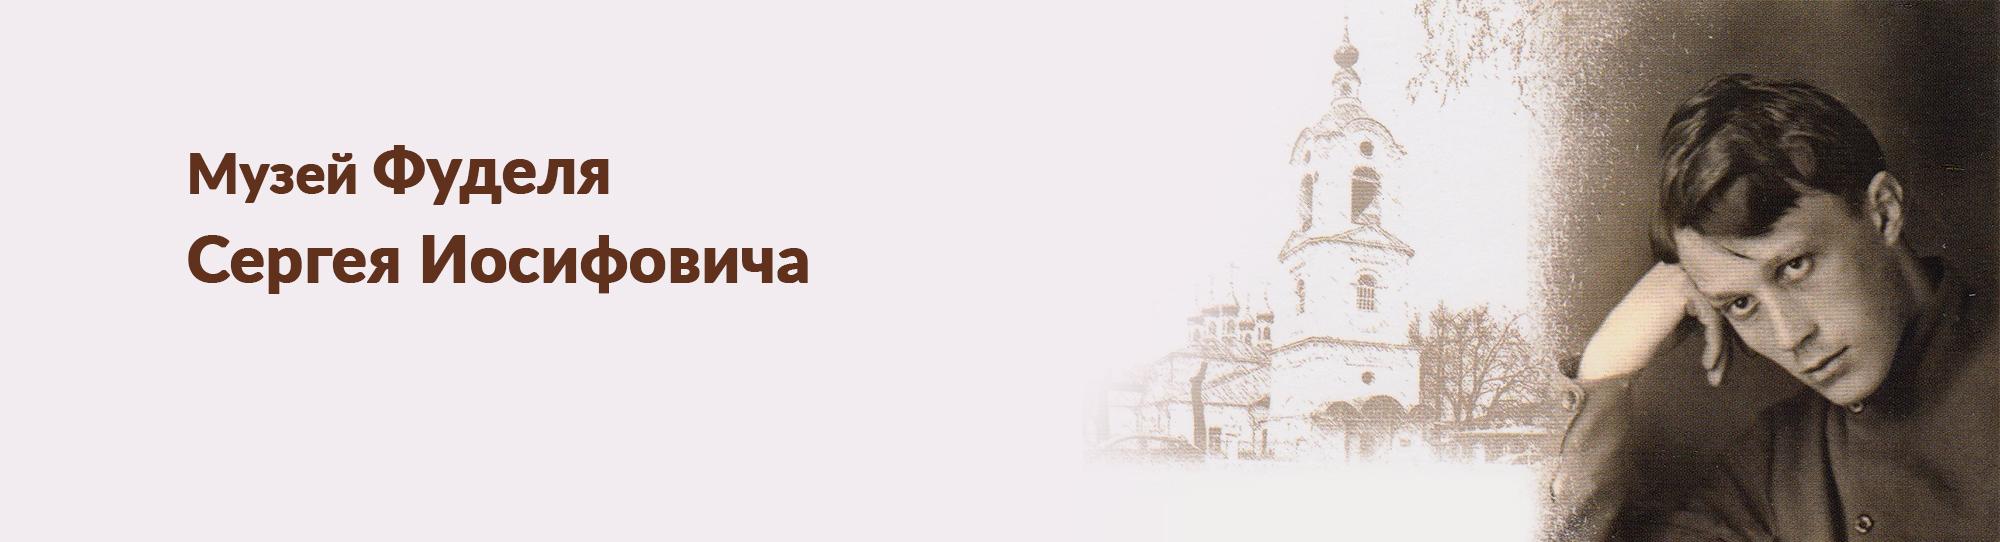 banner-pokrov-2